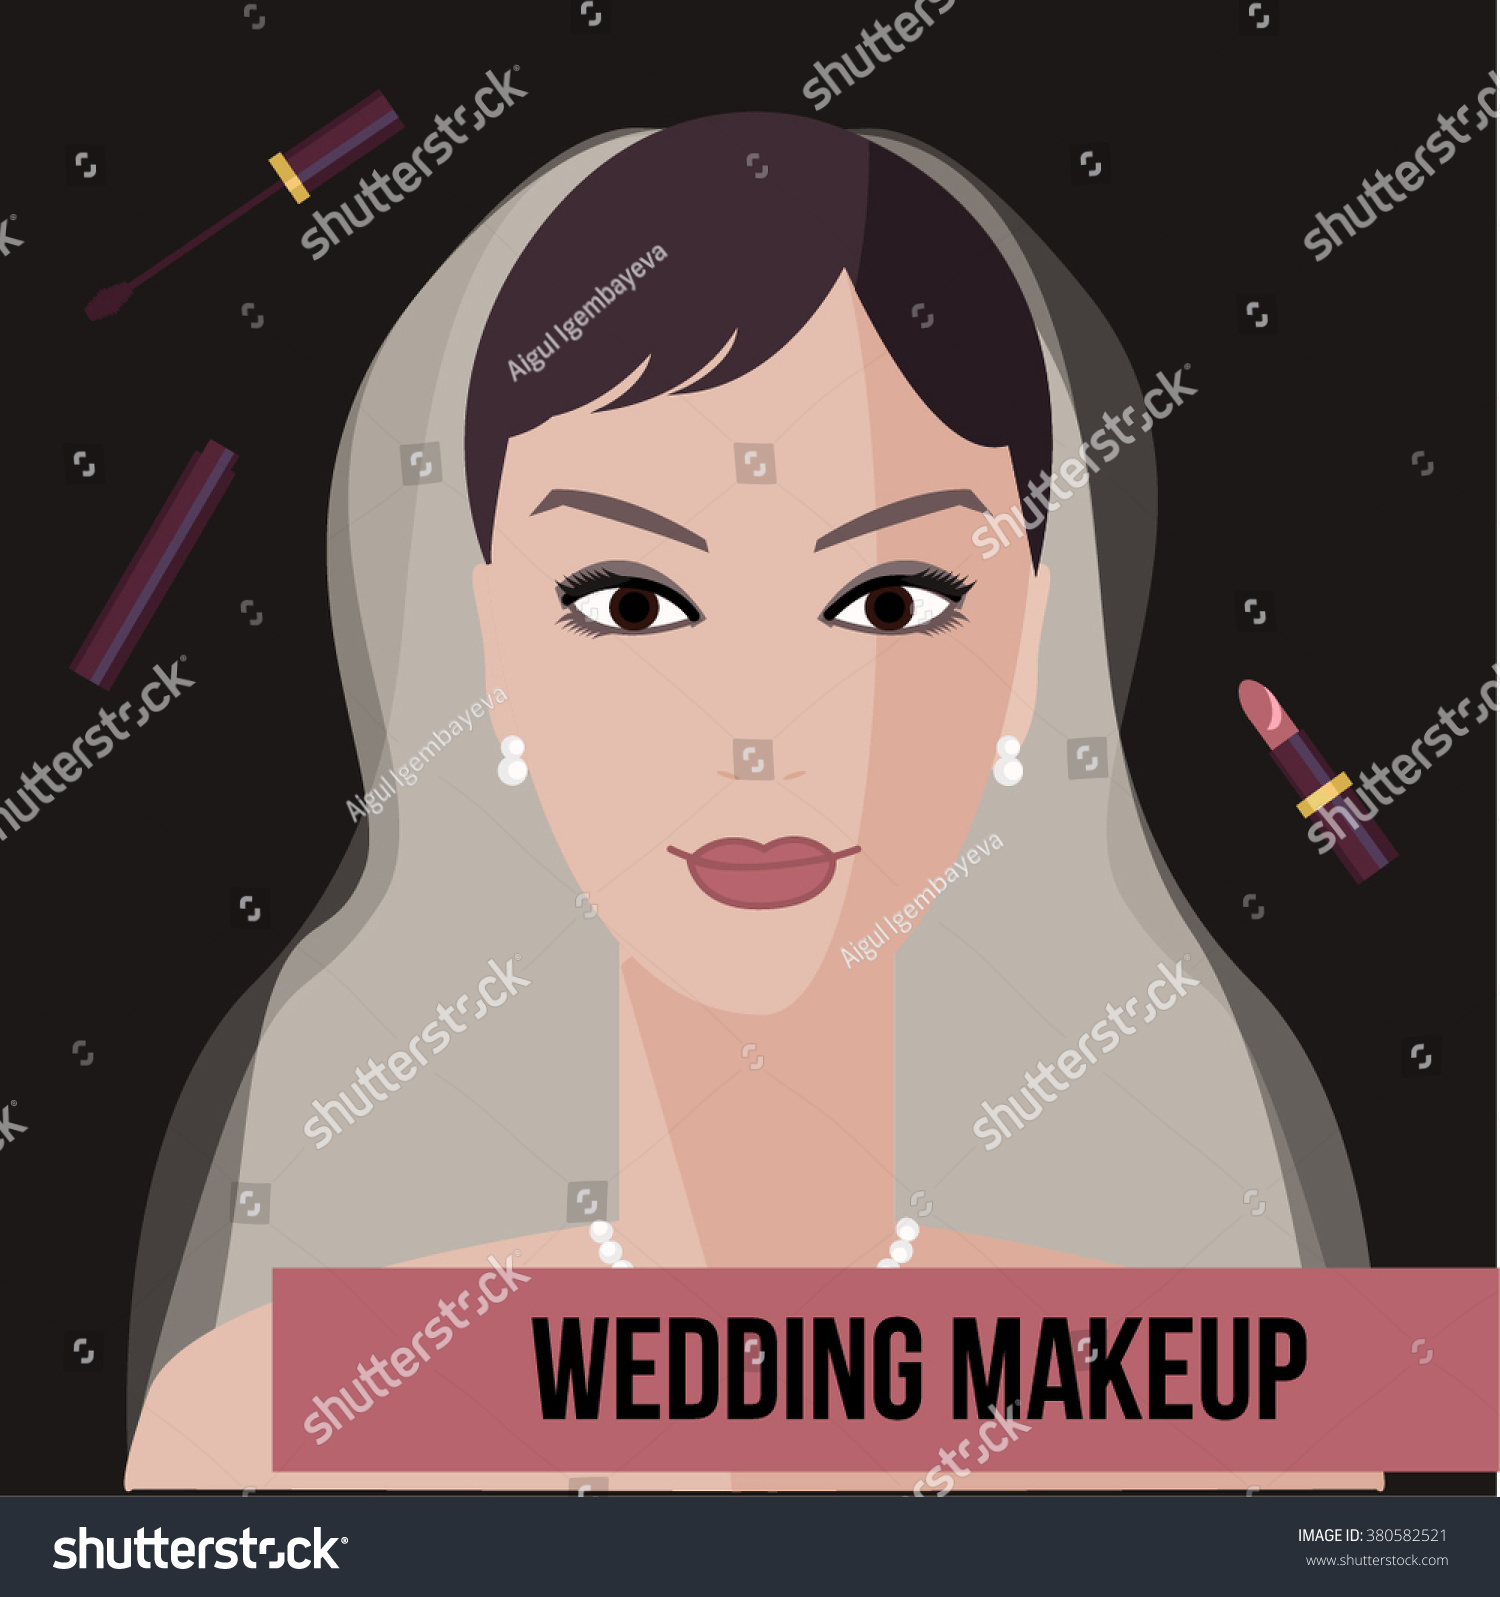 Wedding Makeup Tutorial Red Lips : Wedding Makeup Red Lips Tutorial - Mugeek Vidalondon